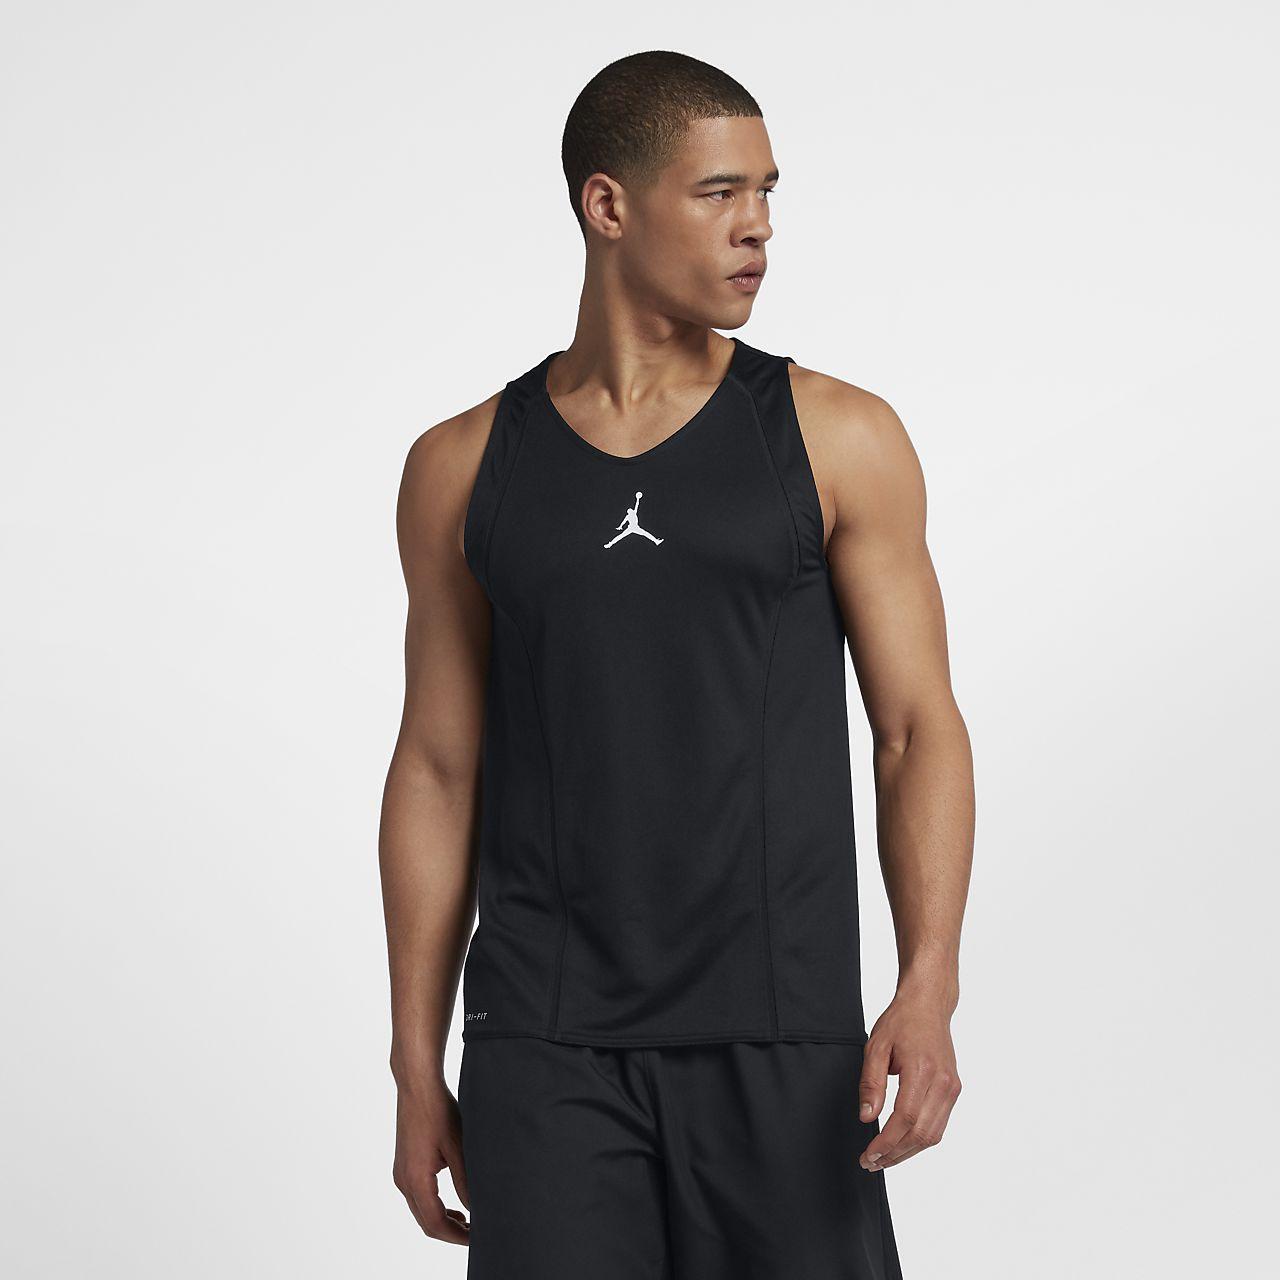 c08e0cb3743d3c Jordan Ultimate Flight Men s Basketball Jersey. Nike.com AT